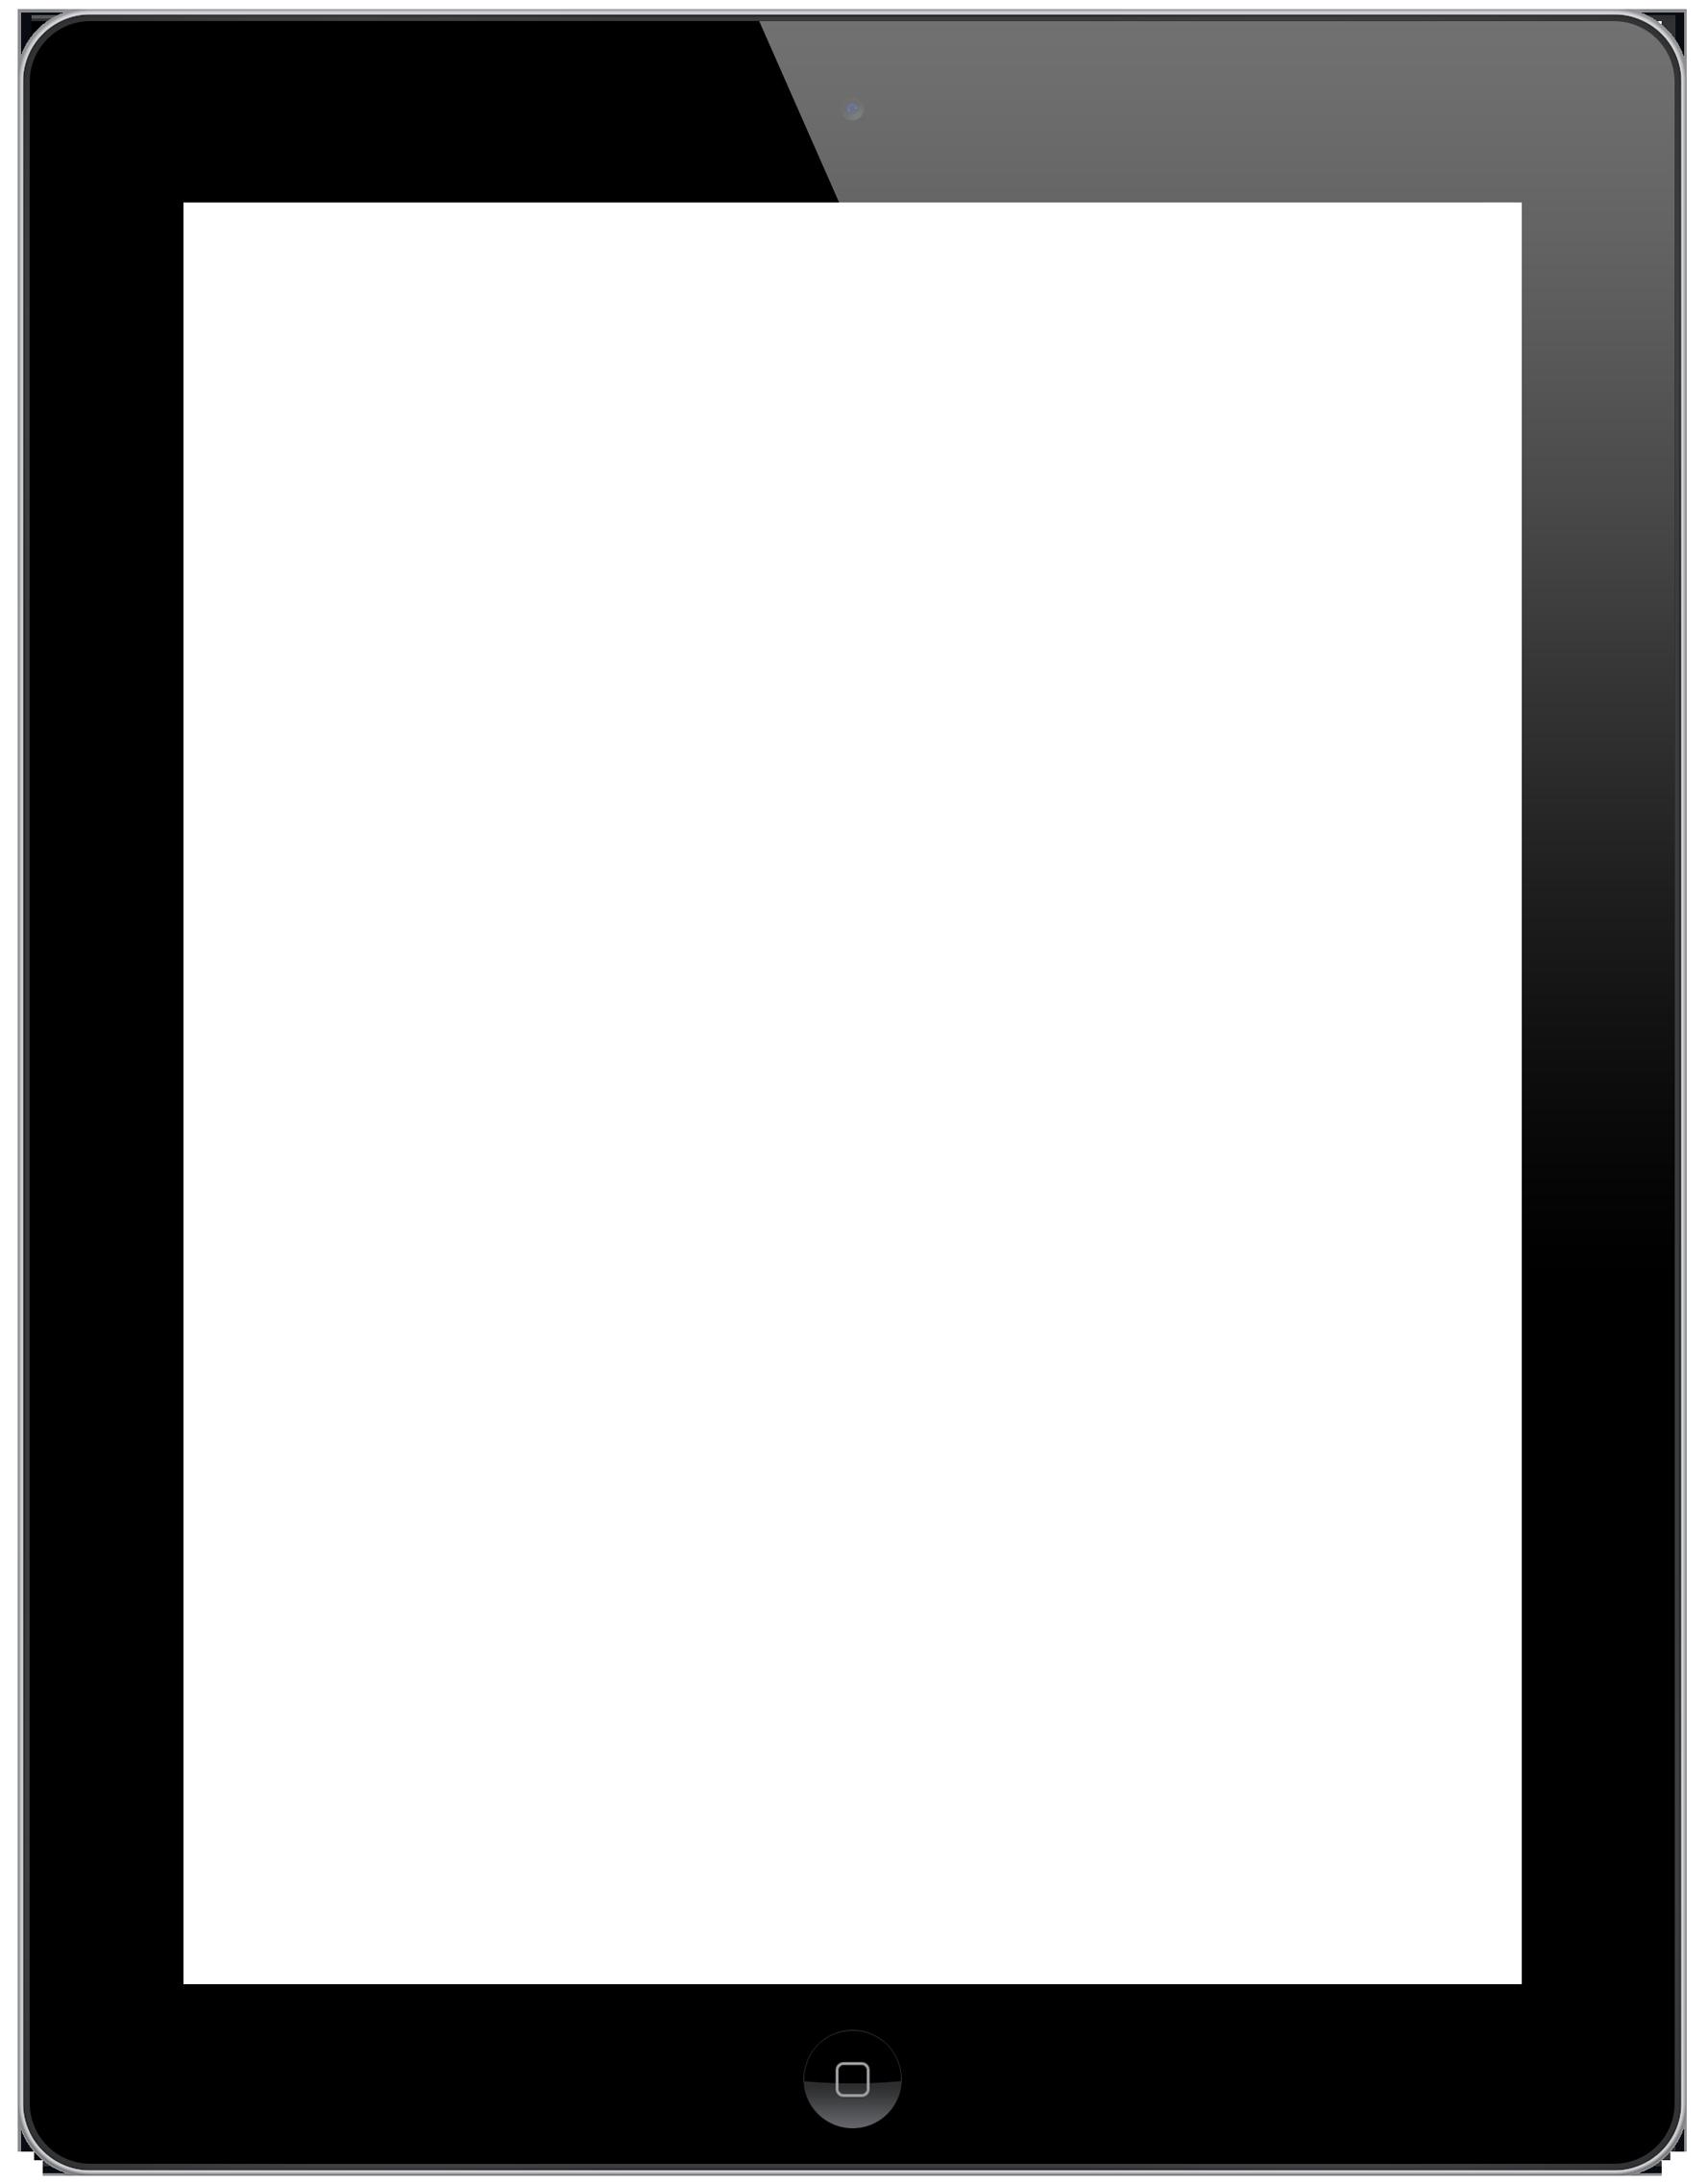 Computer clipart ipad. Tablet png image purepng